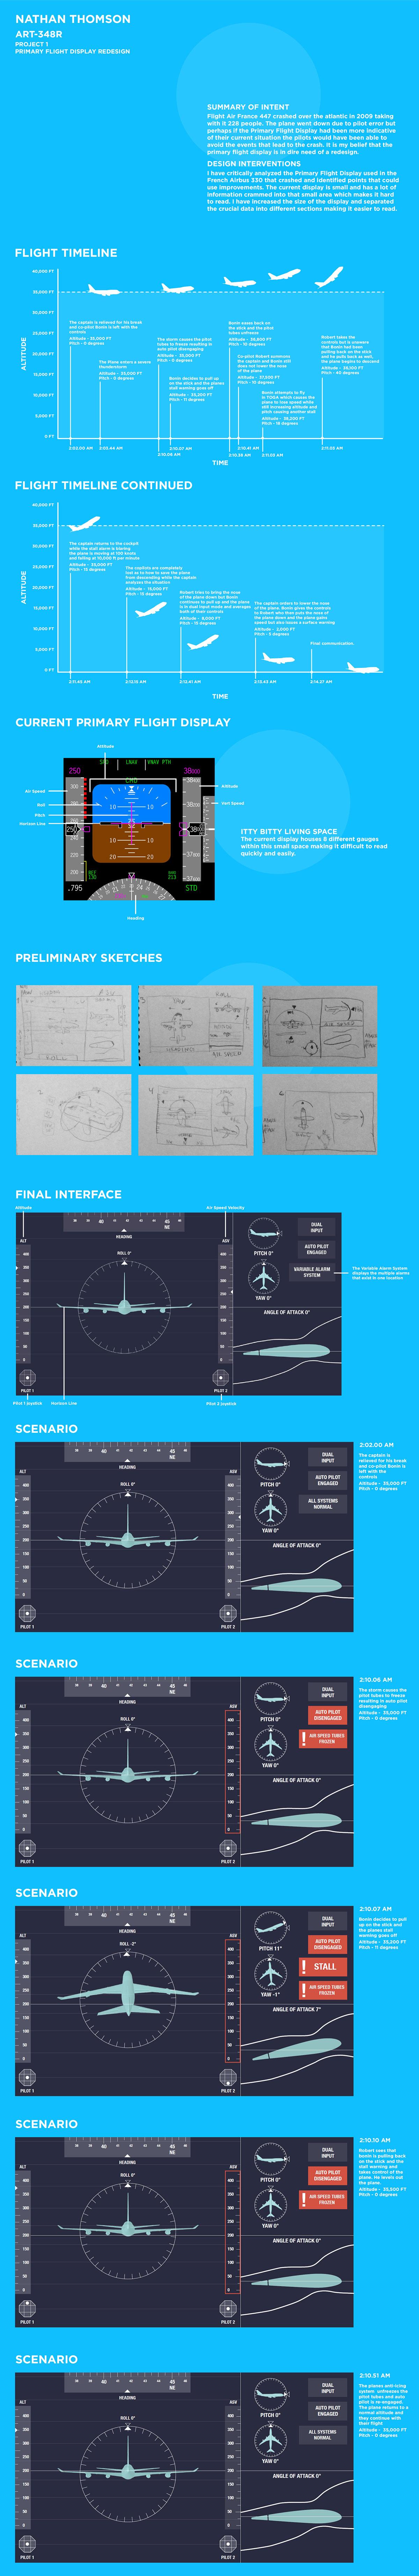 UI,ux,design,plane,flight,Primary Flight Display